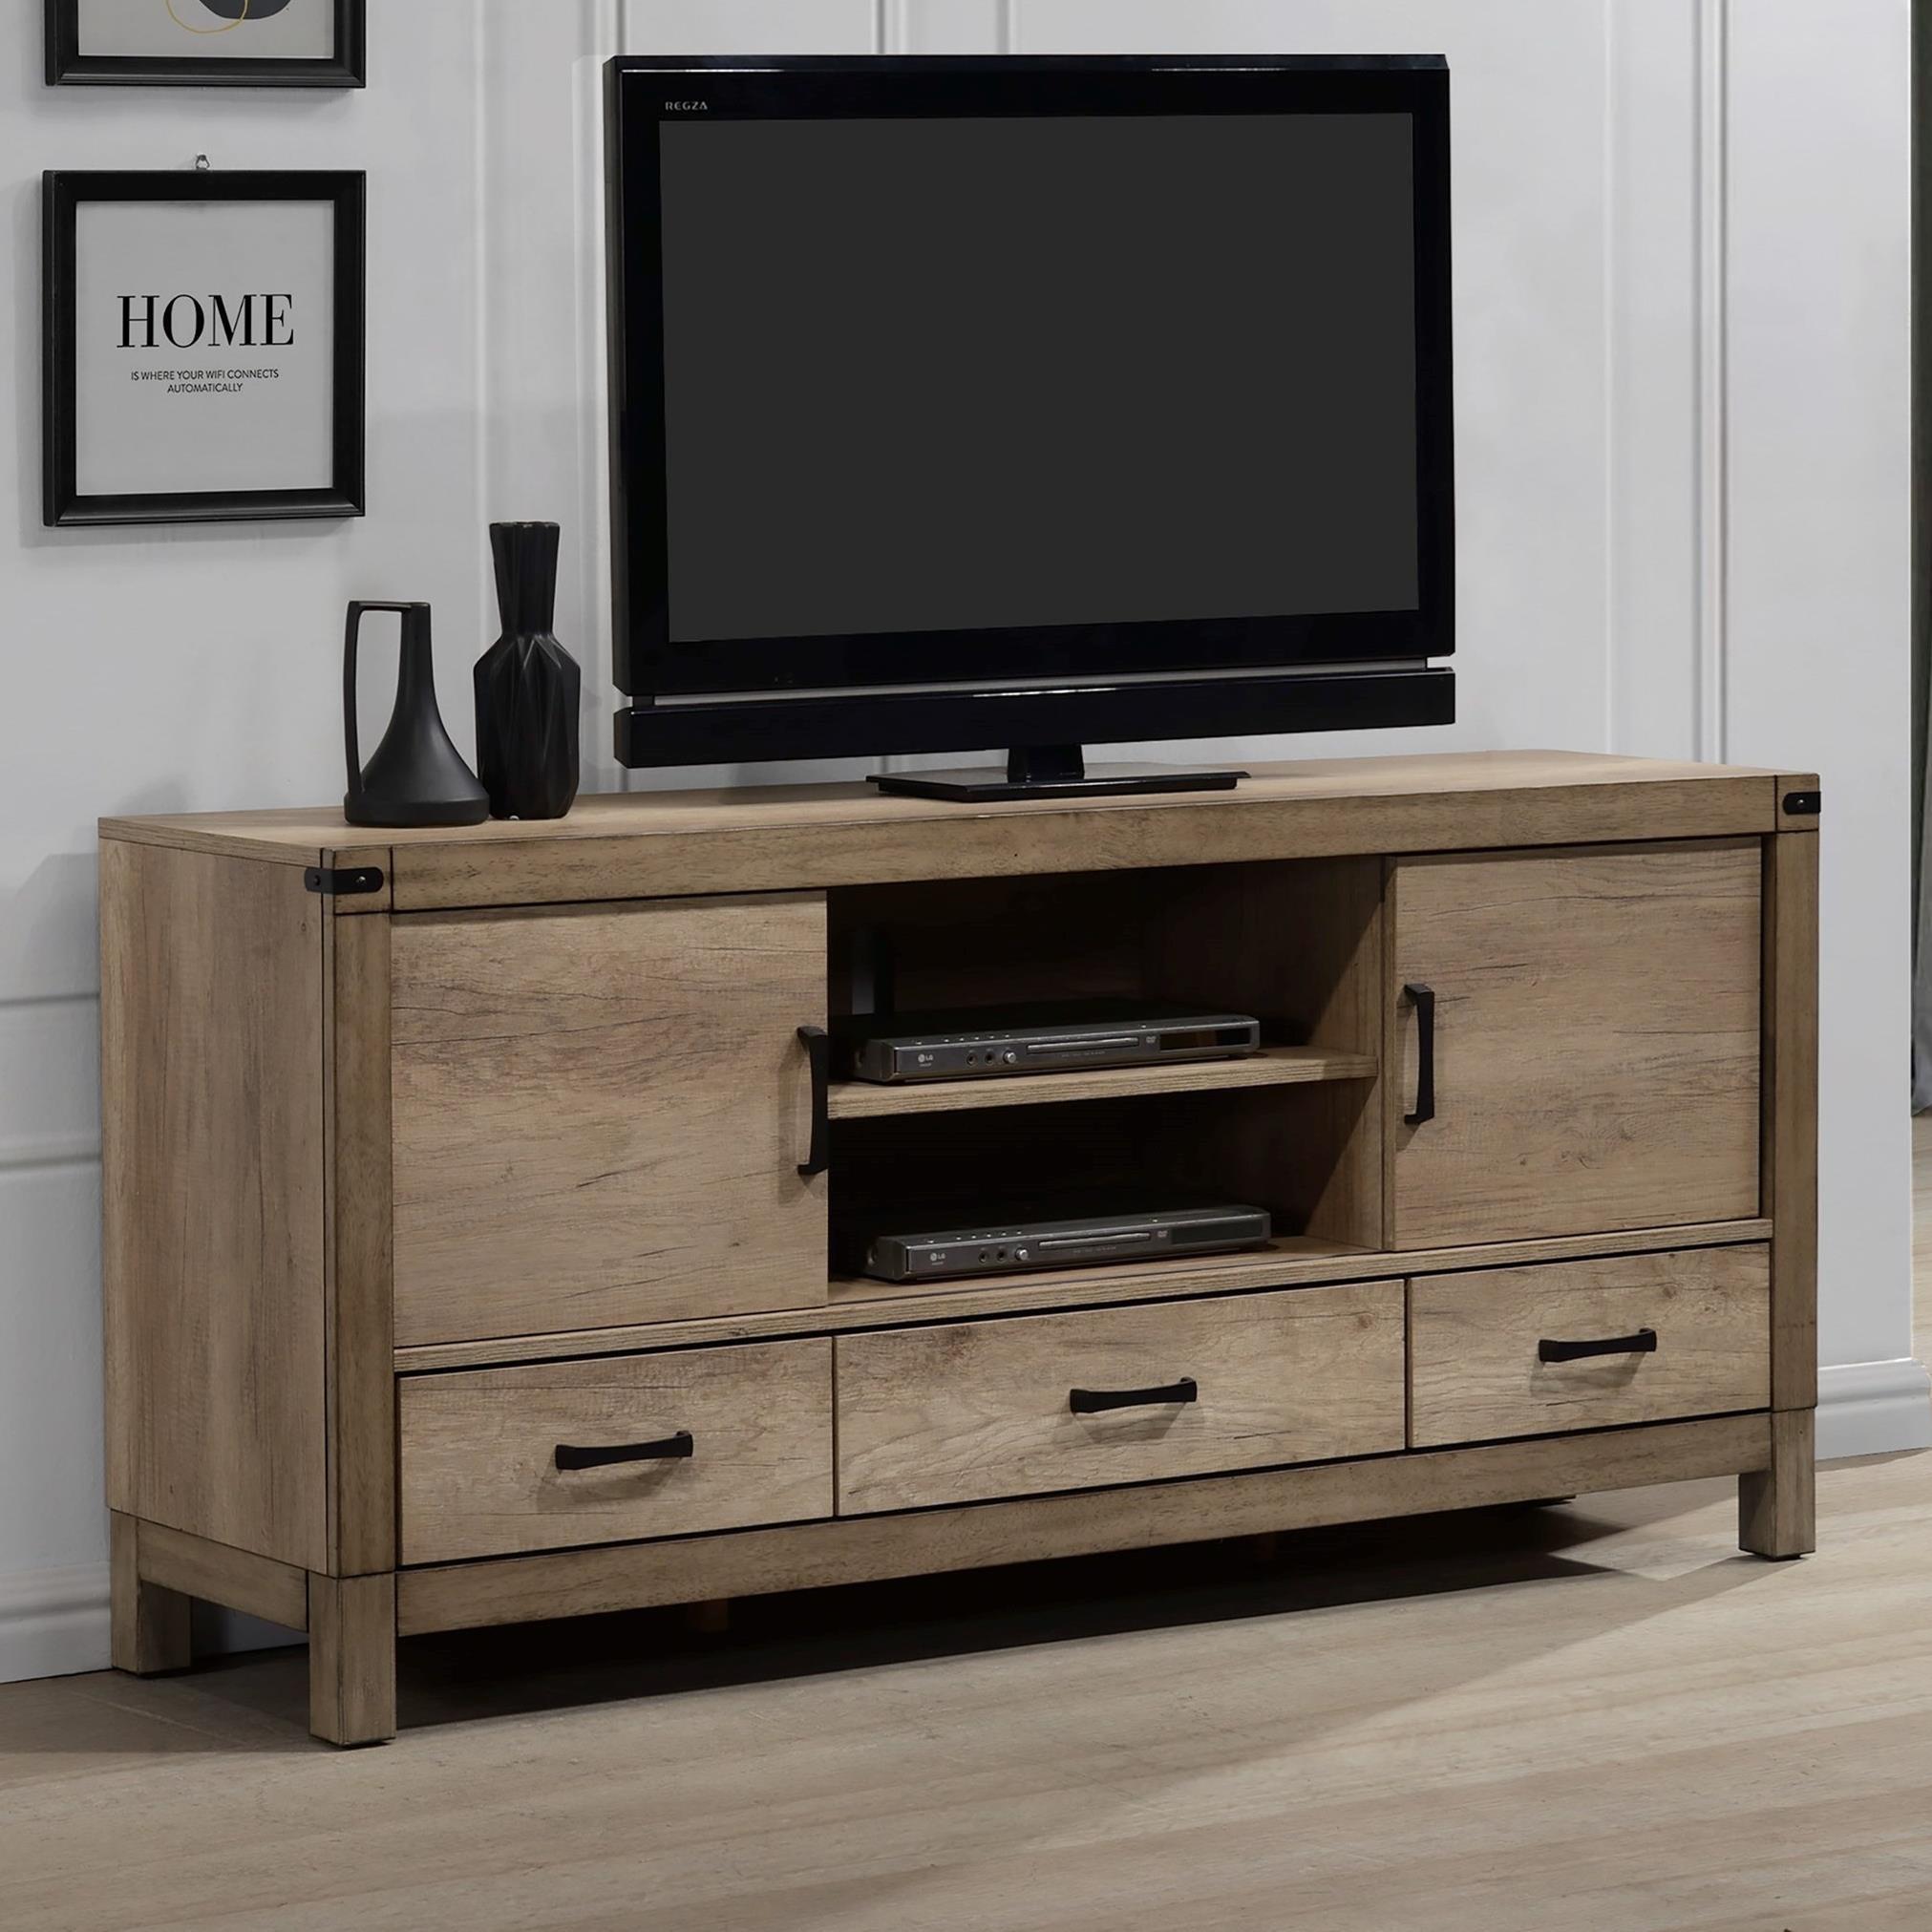 3-Drawer TV Stand